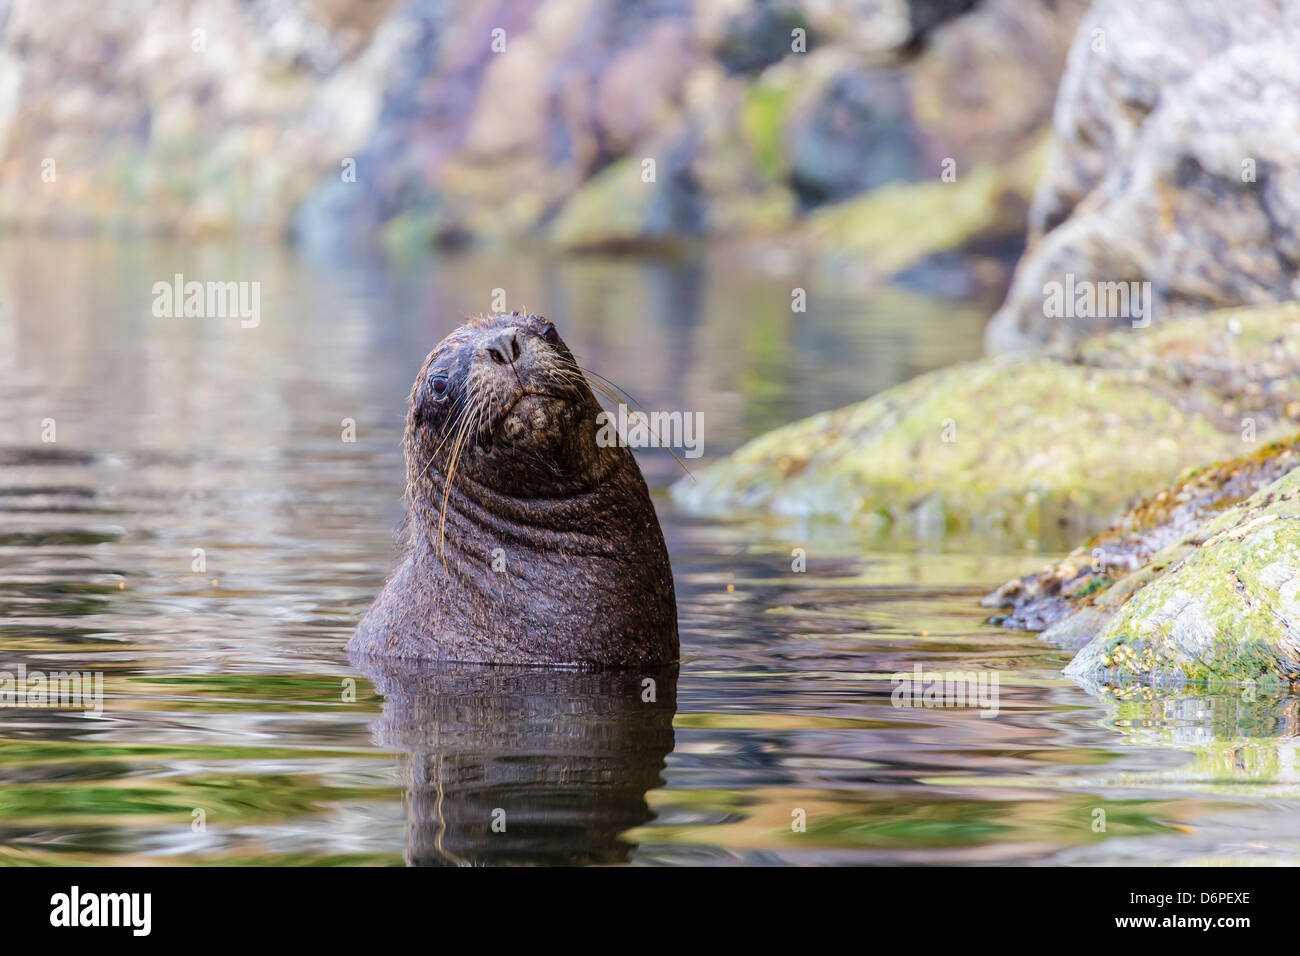 León marino sudamericano (Otaria flavescens) Bull, Seno Agostini Fiordo, Estrecho de Magallanes, Patagonia, Imagen De Stock